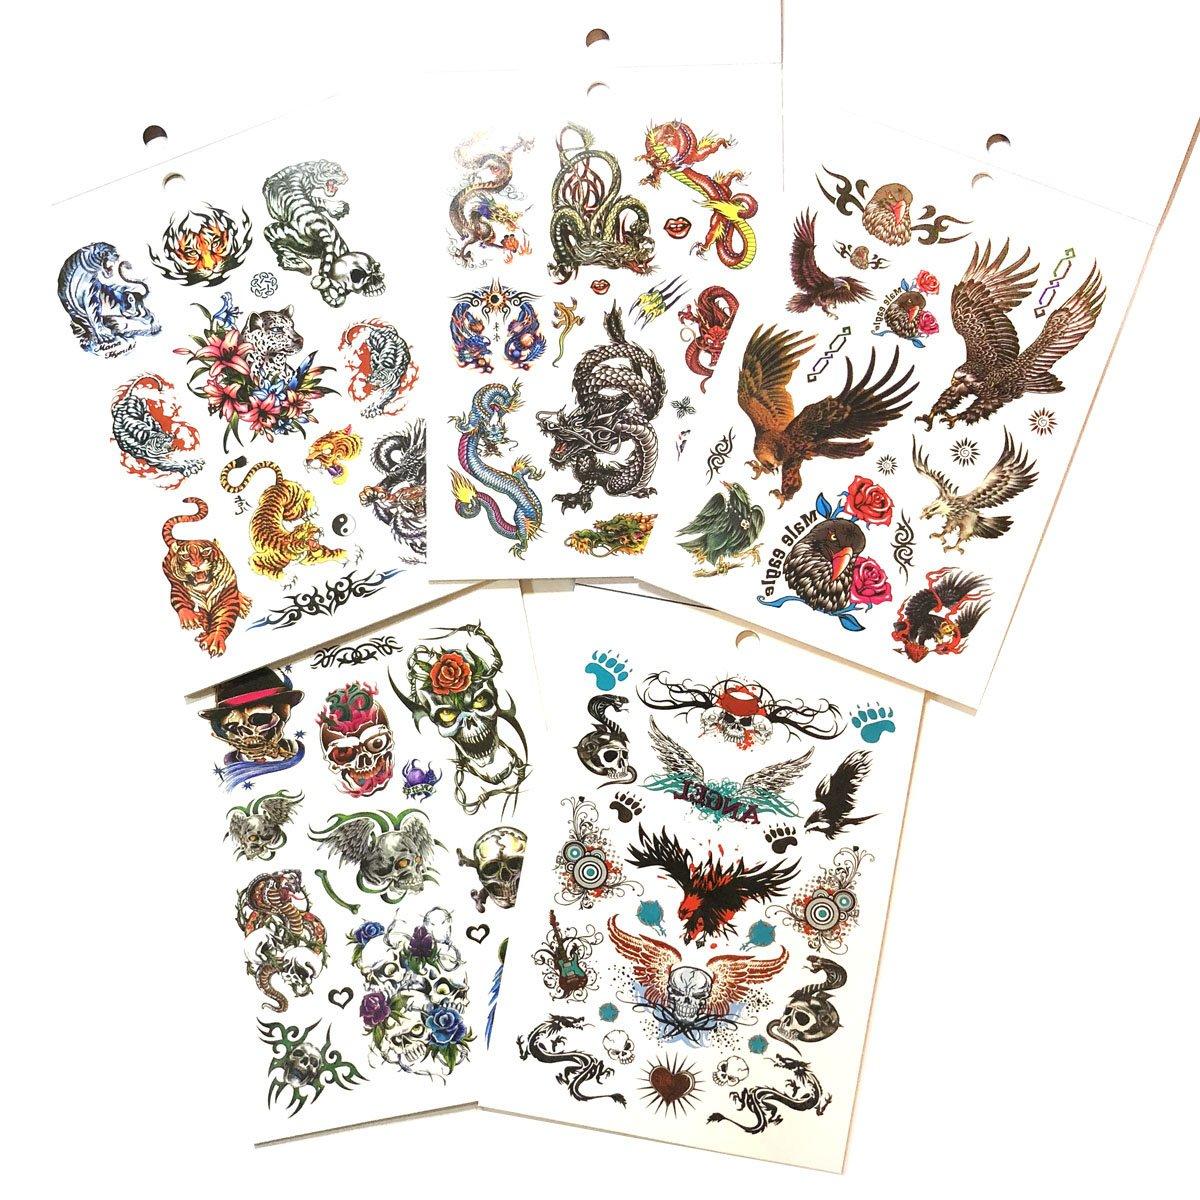 5 Packs Body Art Temporary Tattoo Book, Dragon Eagle Skull Animals Tattoos for Guys Halloween Tattoos for Guys